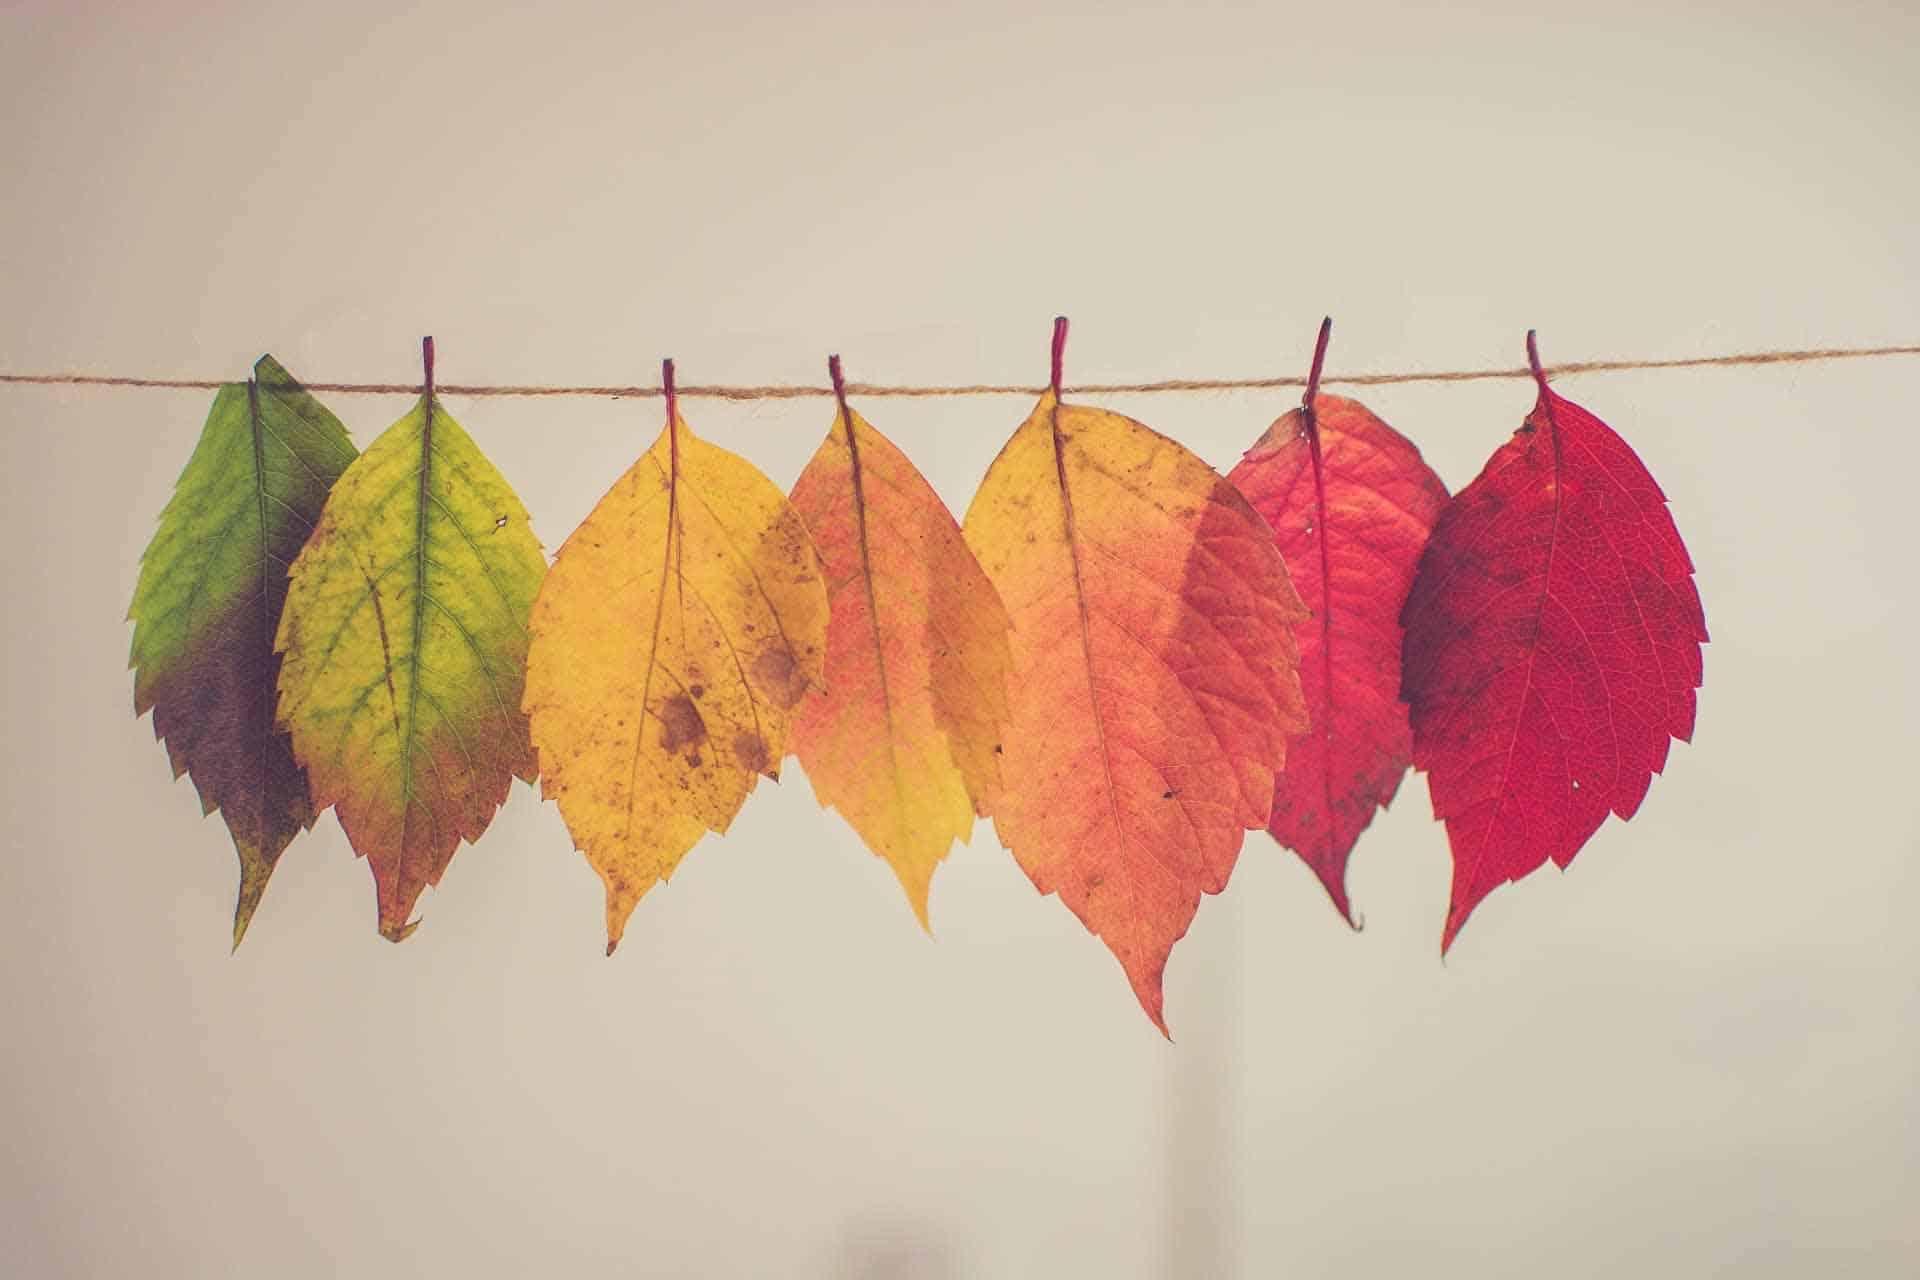 t2informatik Blog: Transformation ist immer